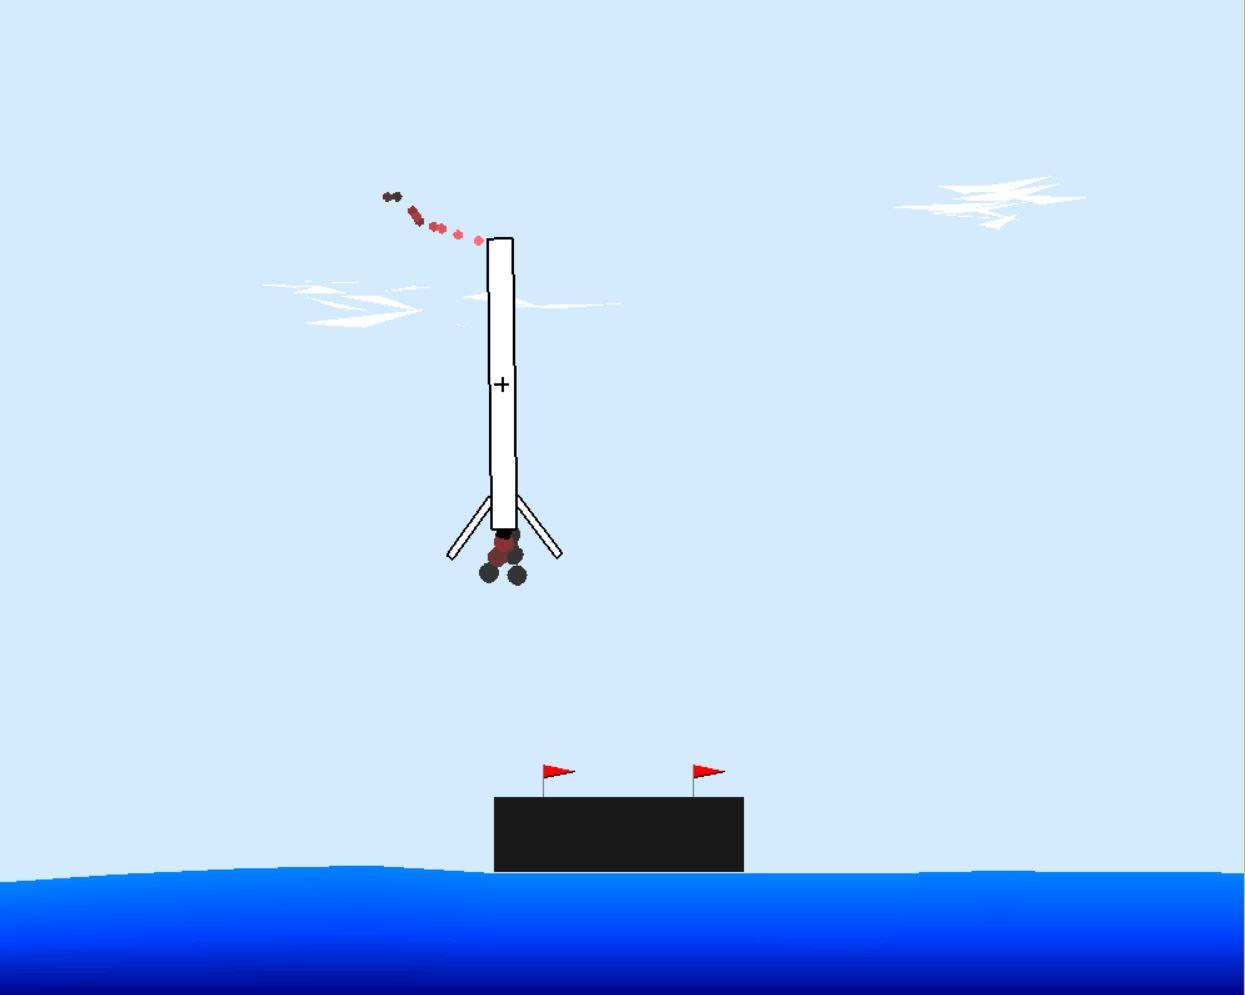 rocket-lander/readme md at master · arex18/rocket-lander